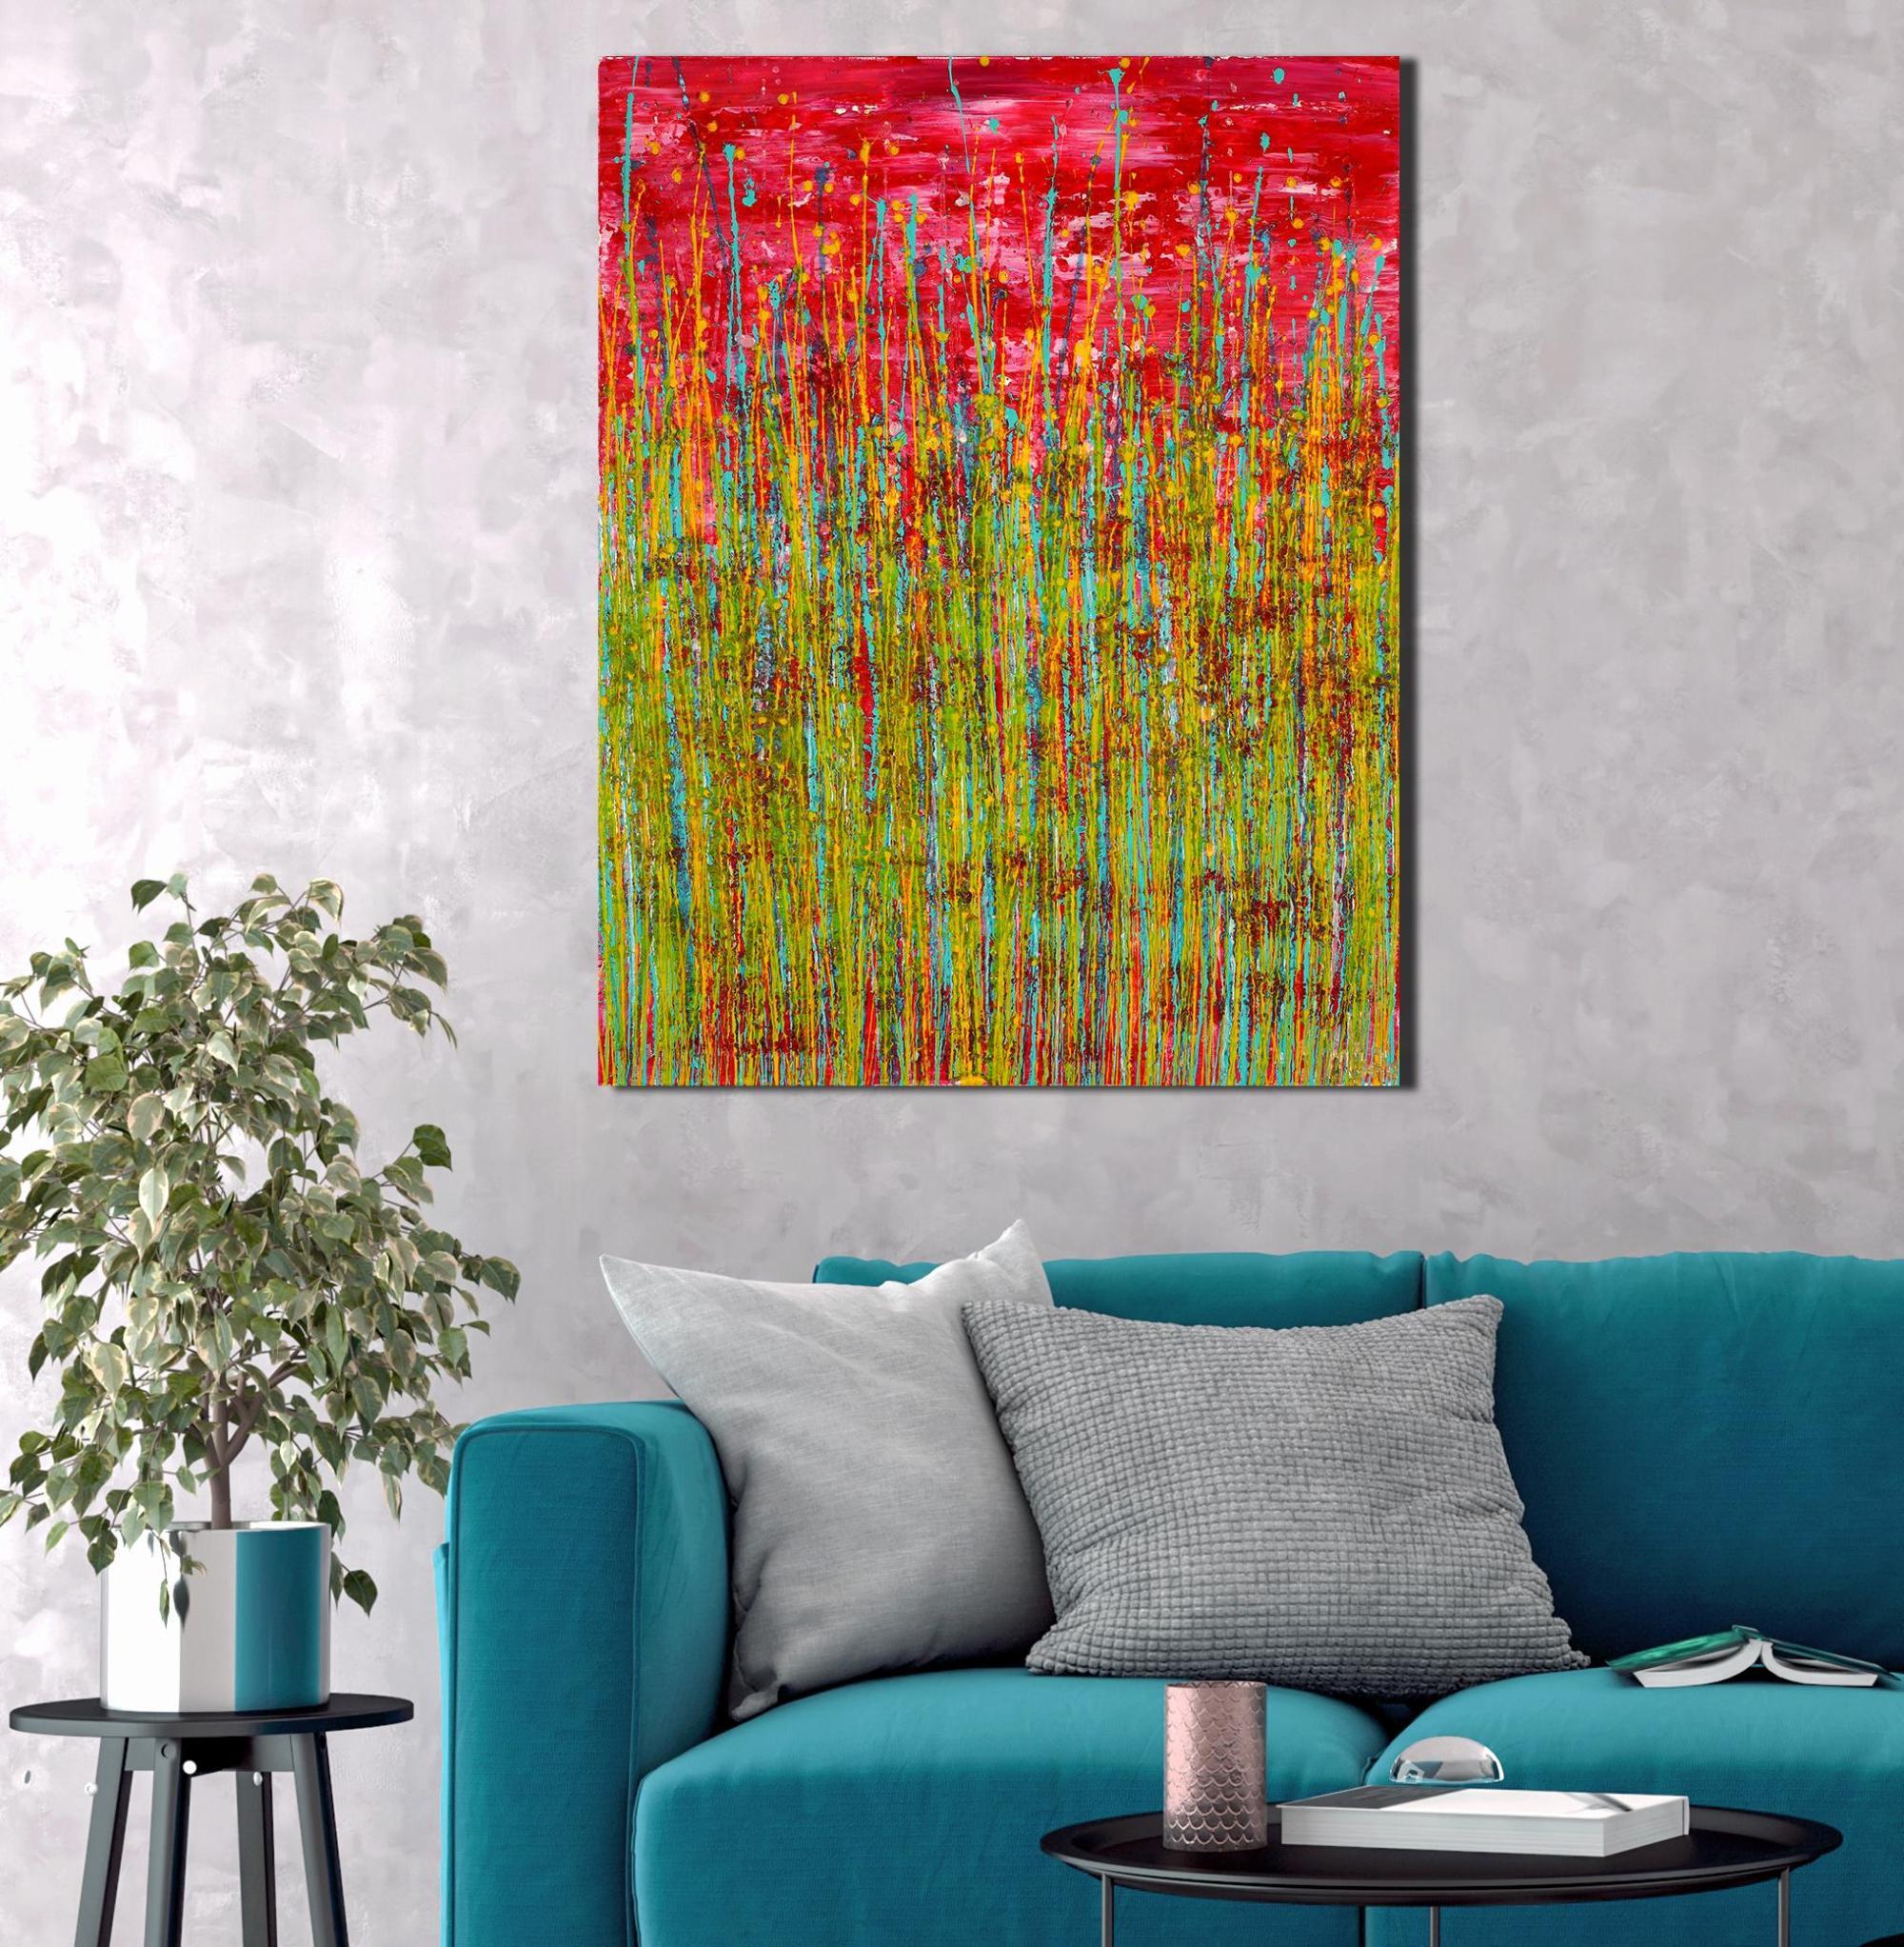 Room View / Caribbean Reflections 4 (2021) / Artist: Nestor Toro